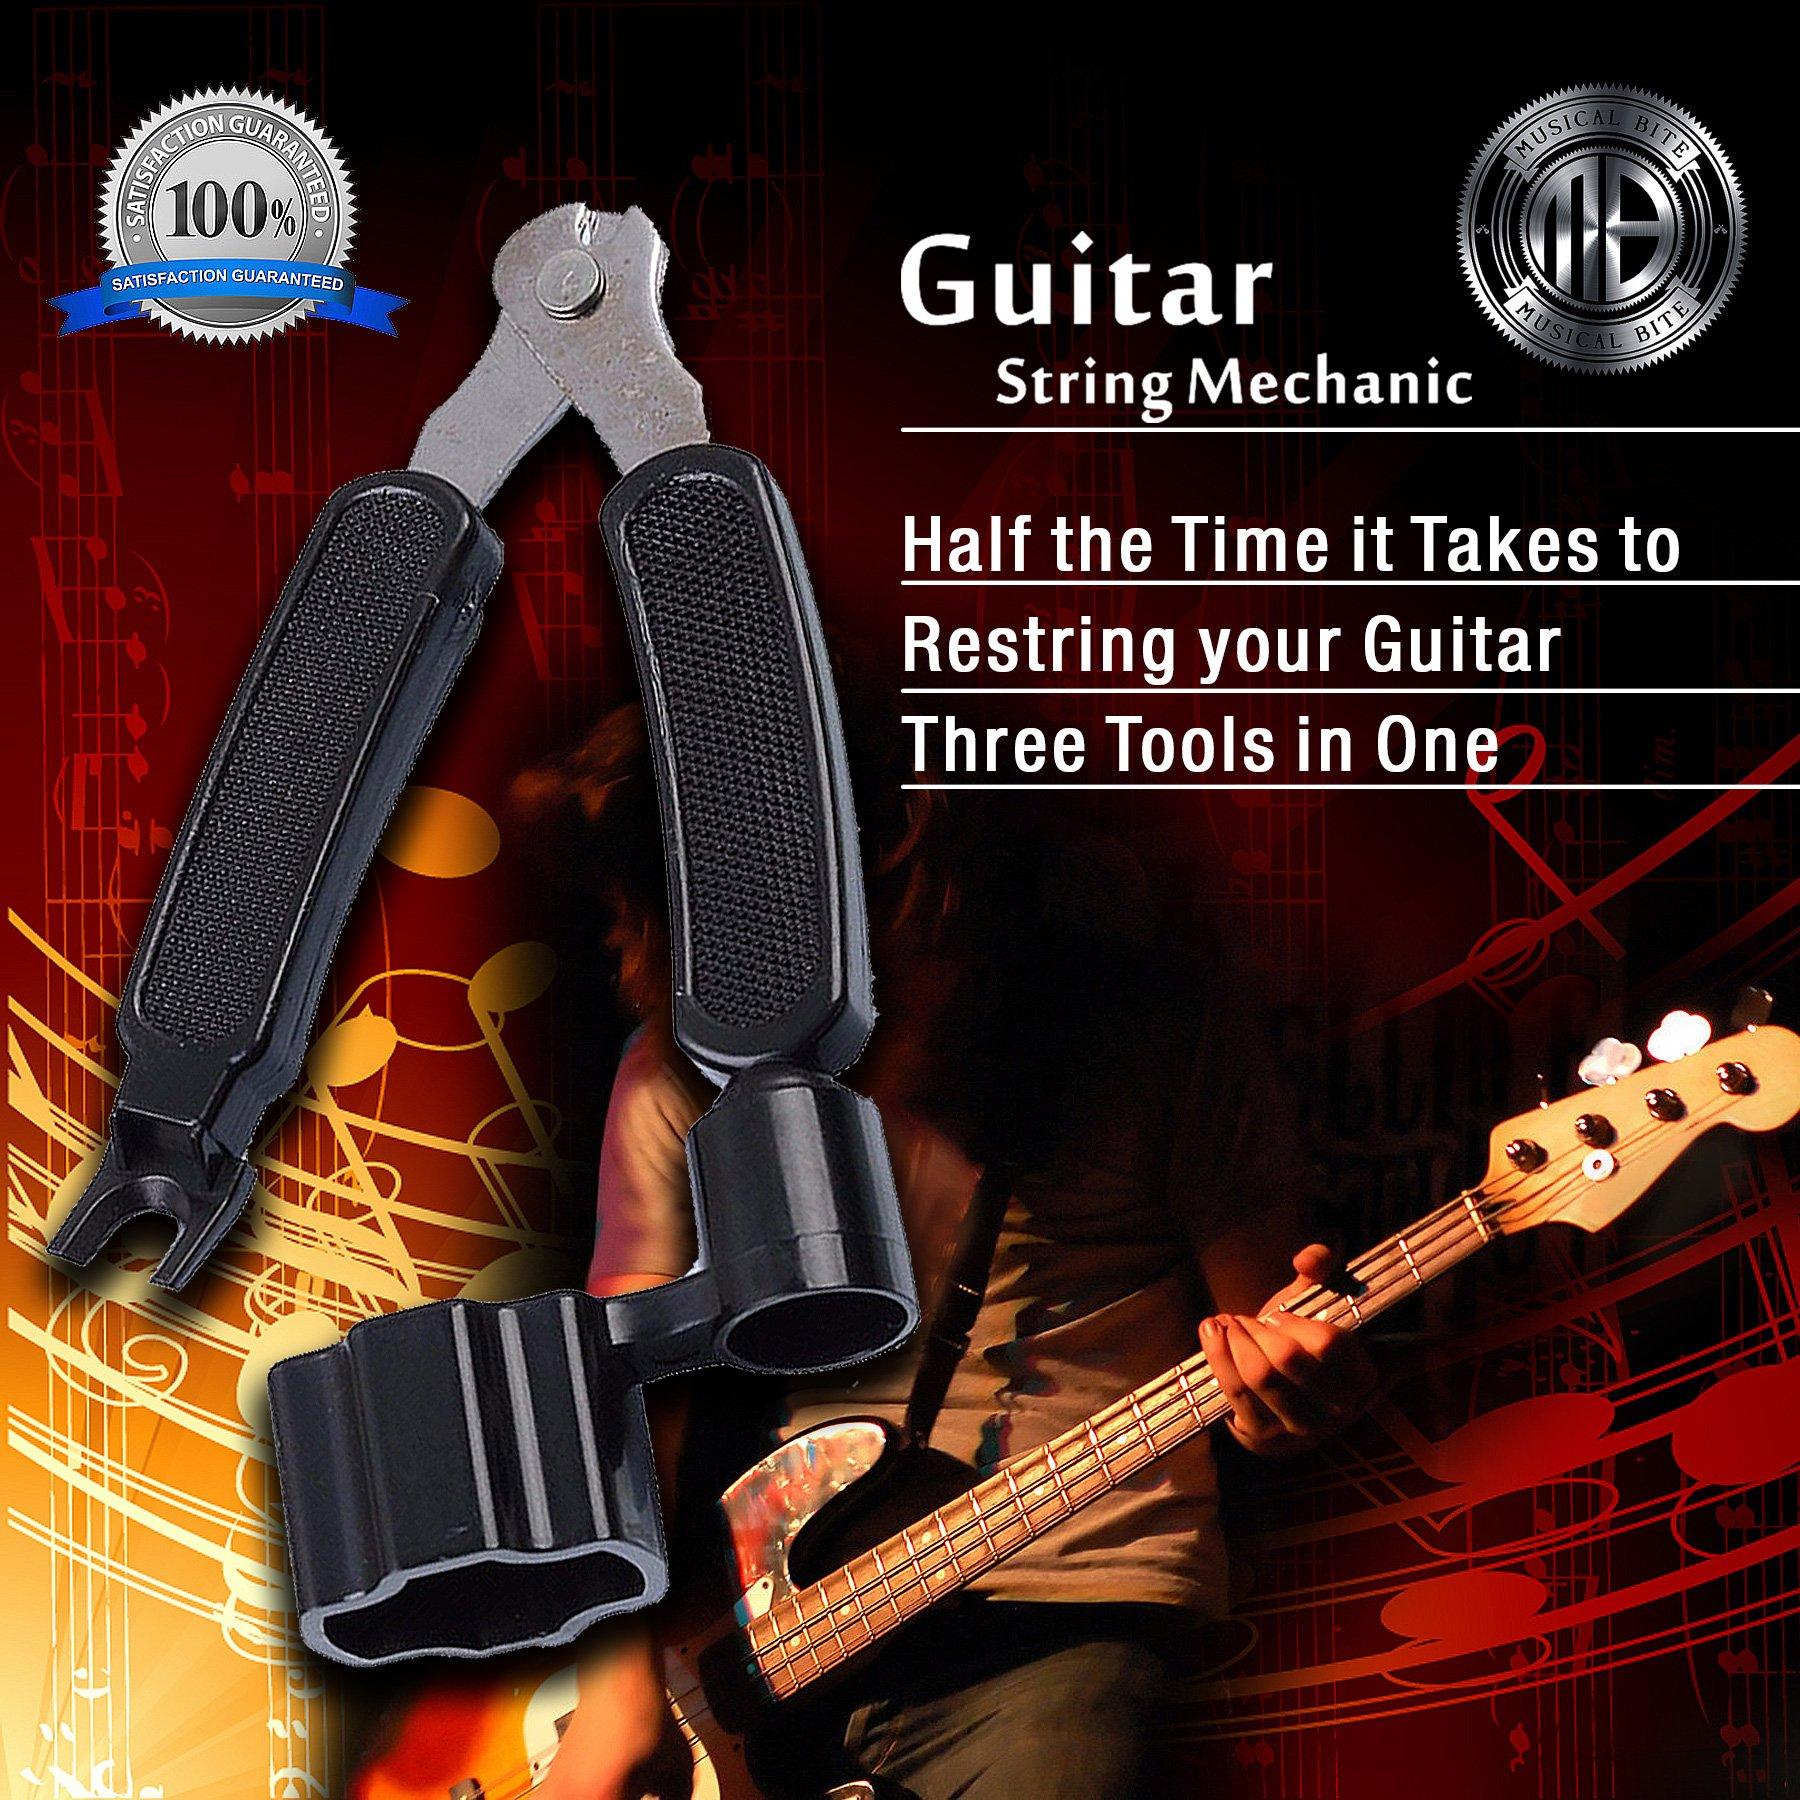 Kit multifuncional de mantenimiento Guitar String Mechanic, 3 en 1 ...